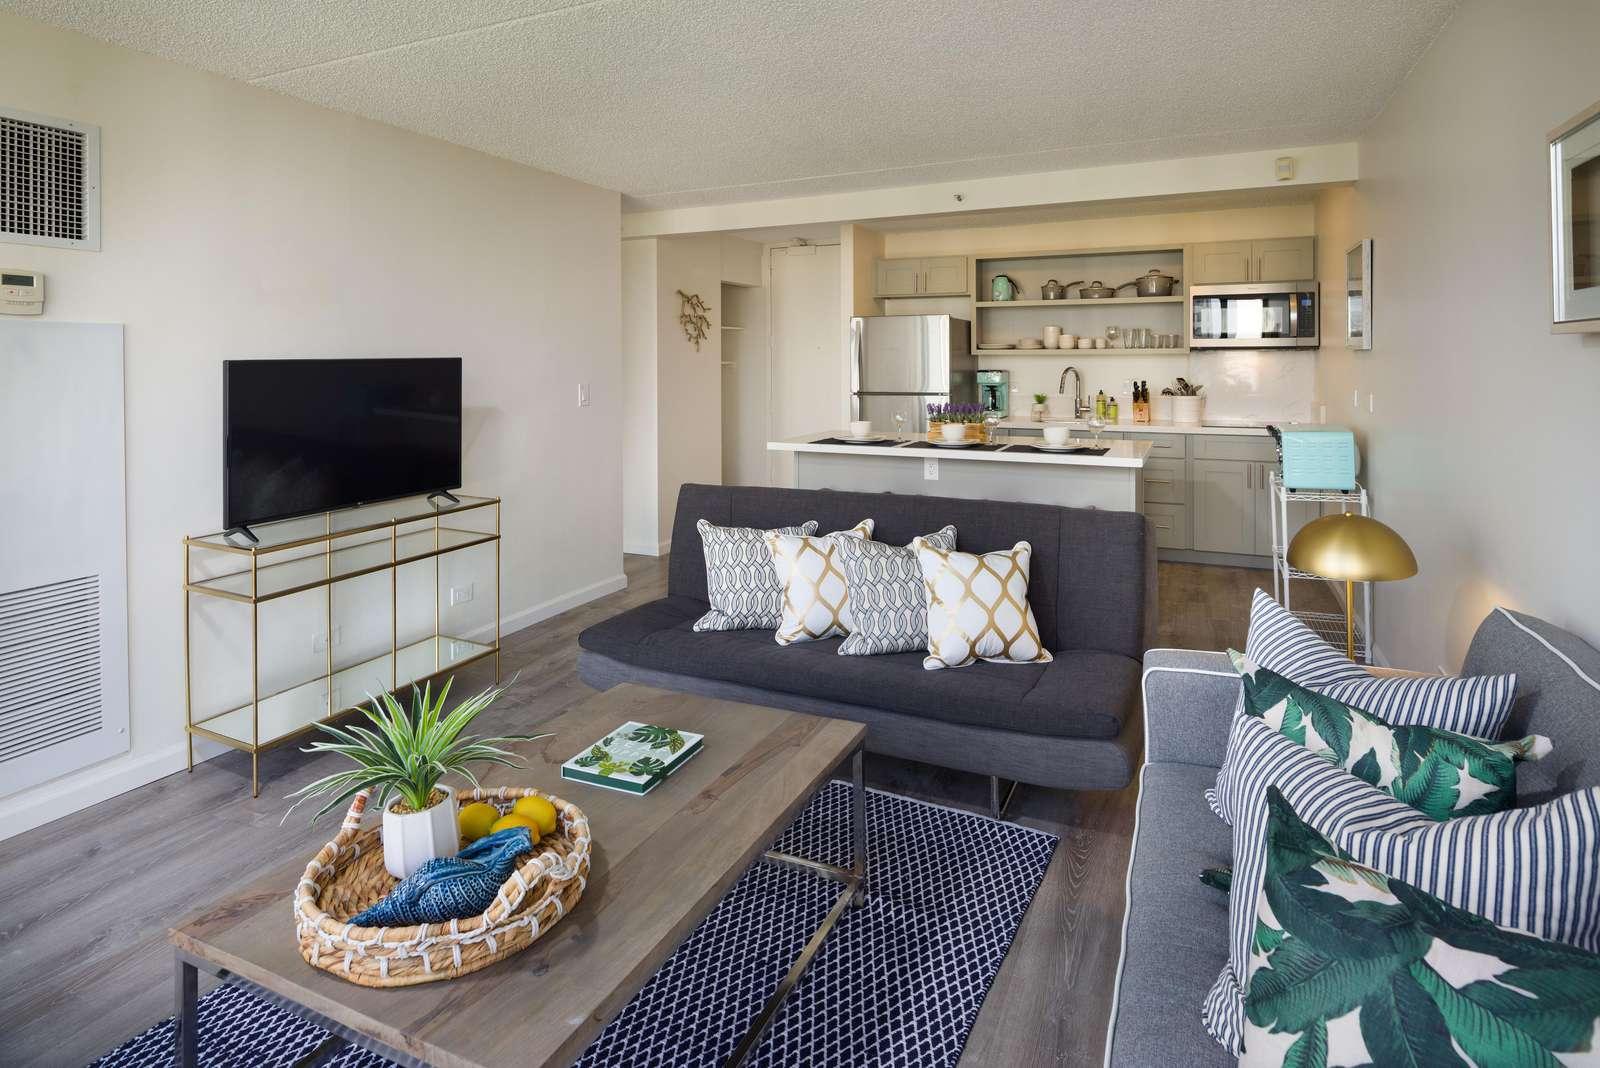 Splendid 1 bedroom at the Waikiki Sunset